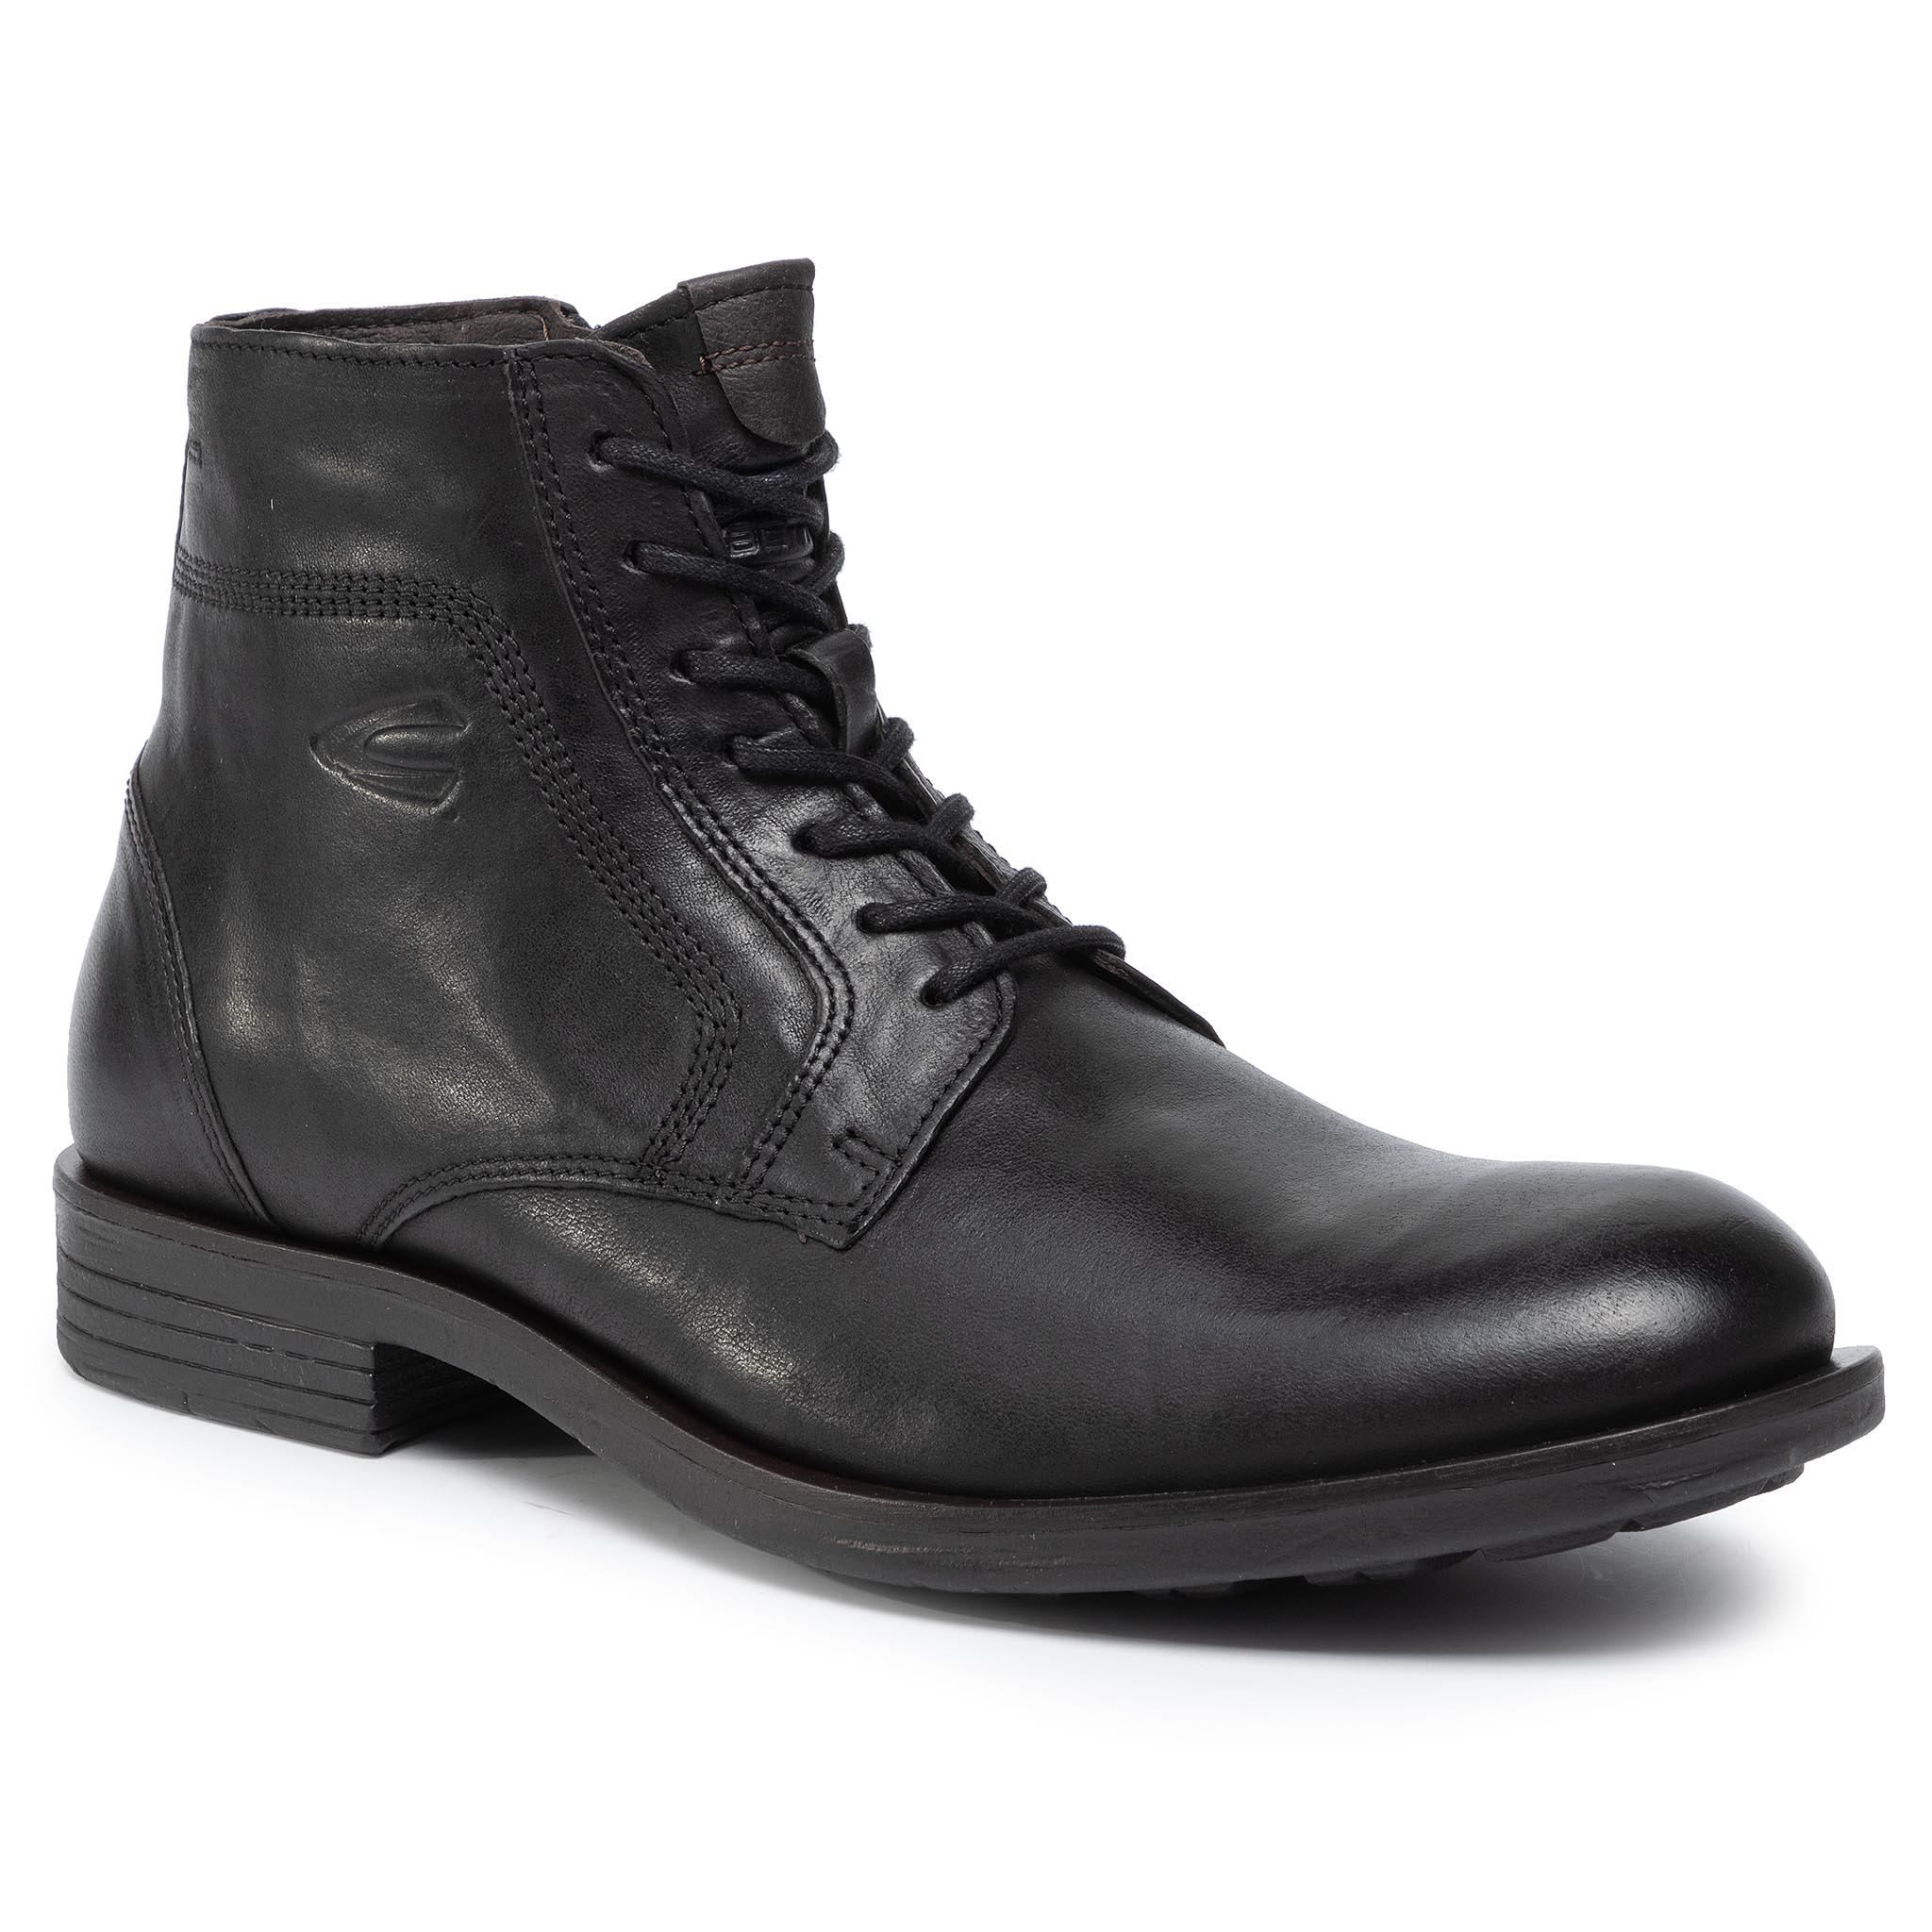 Outdoorová obuv CAMEL ACTIVE - Check 499.14.04 Black